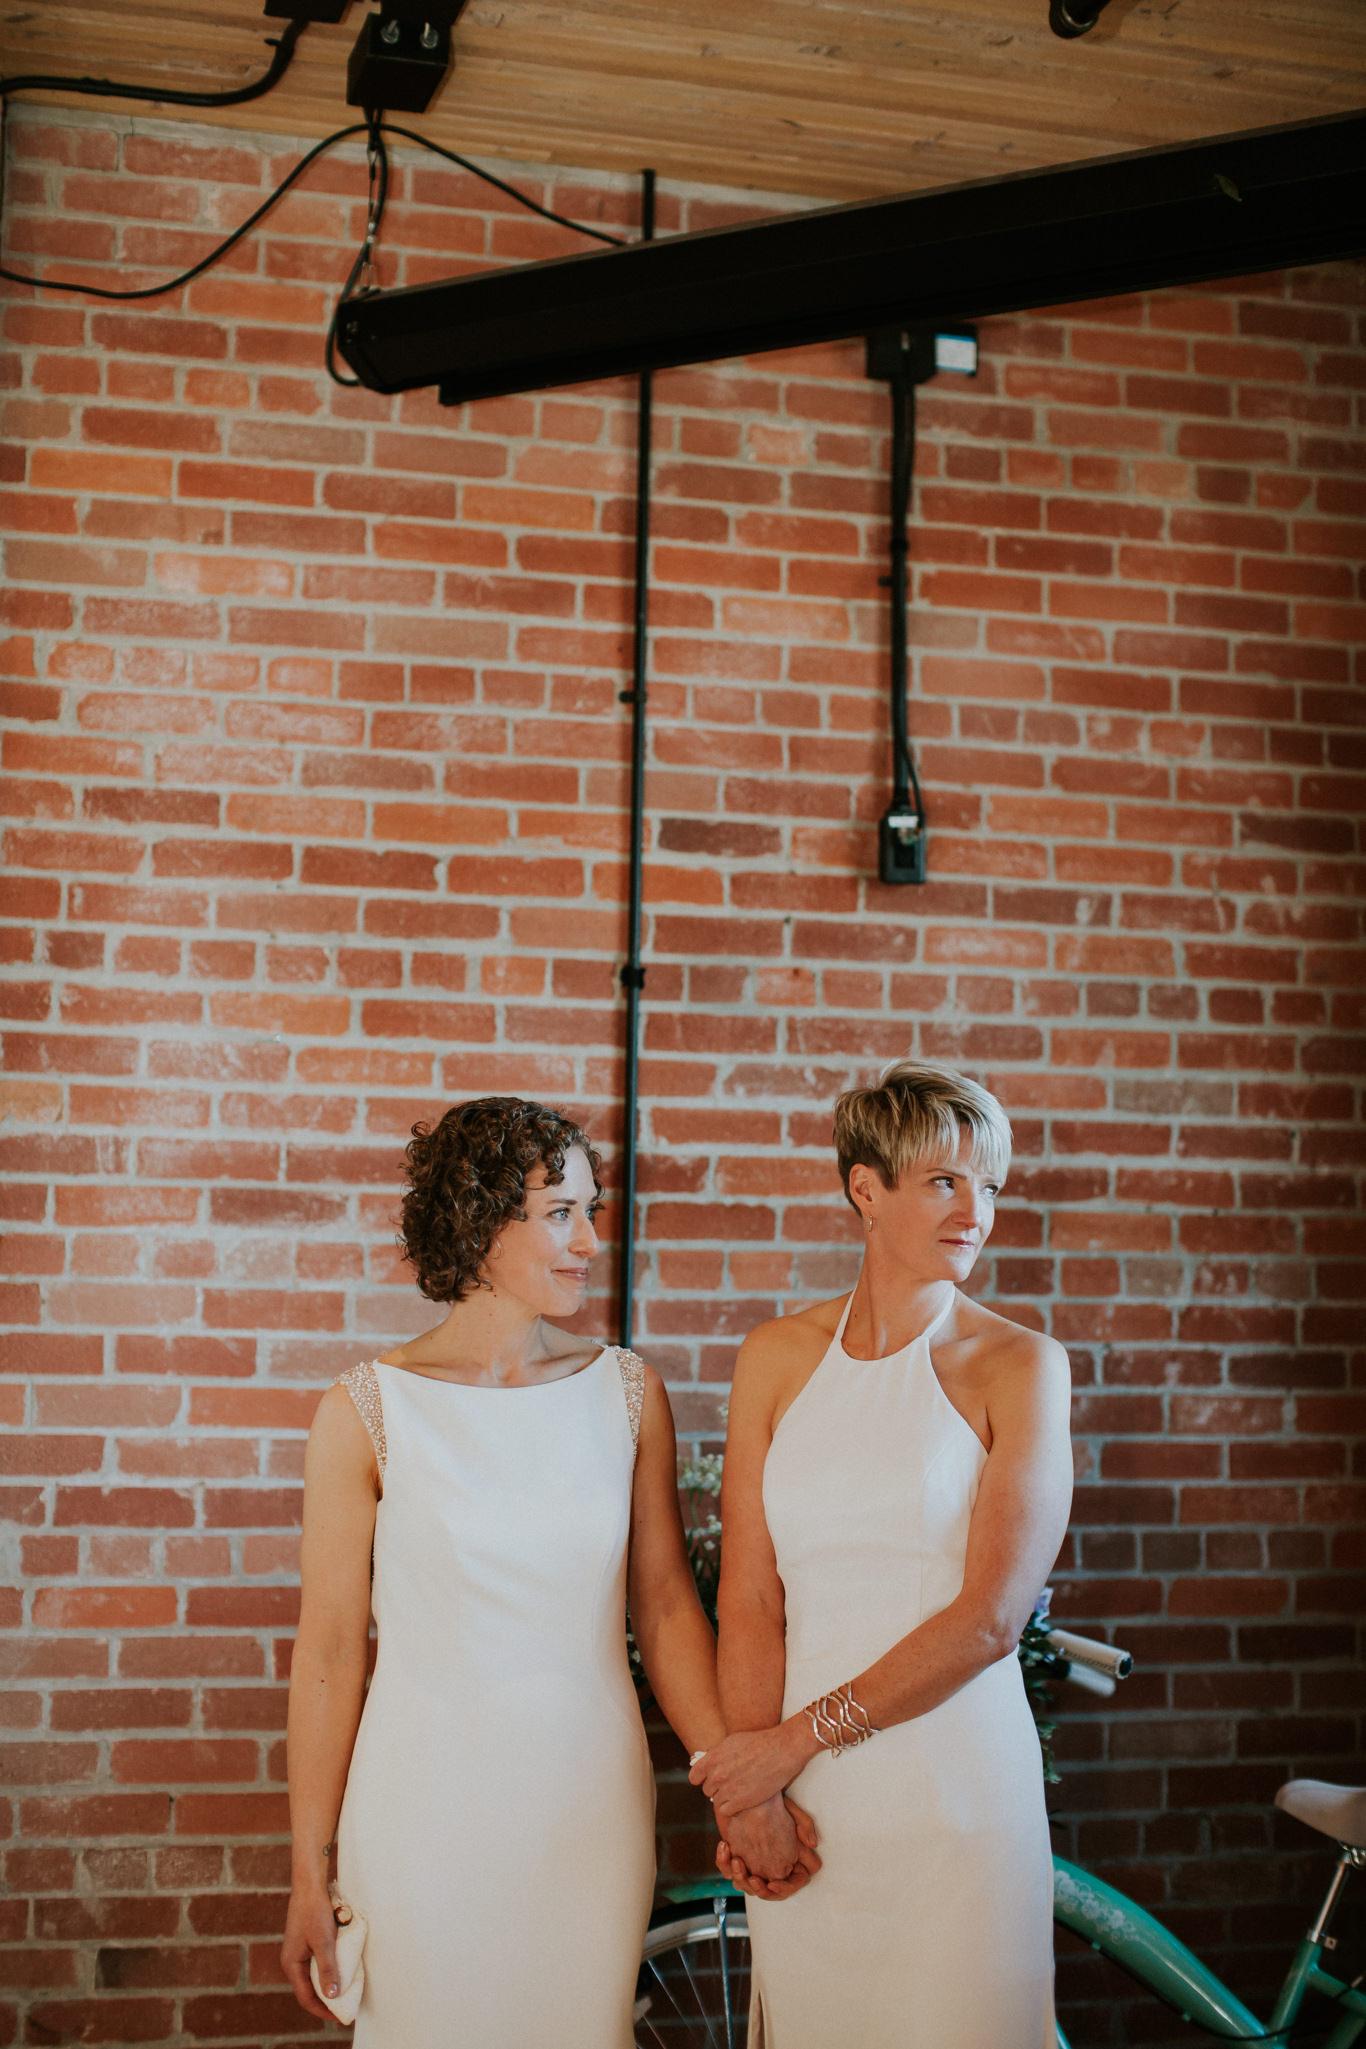 Lindsay-and-Heather-Charbar-Restaurant-Wedding-in-Calgary-96